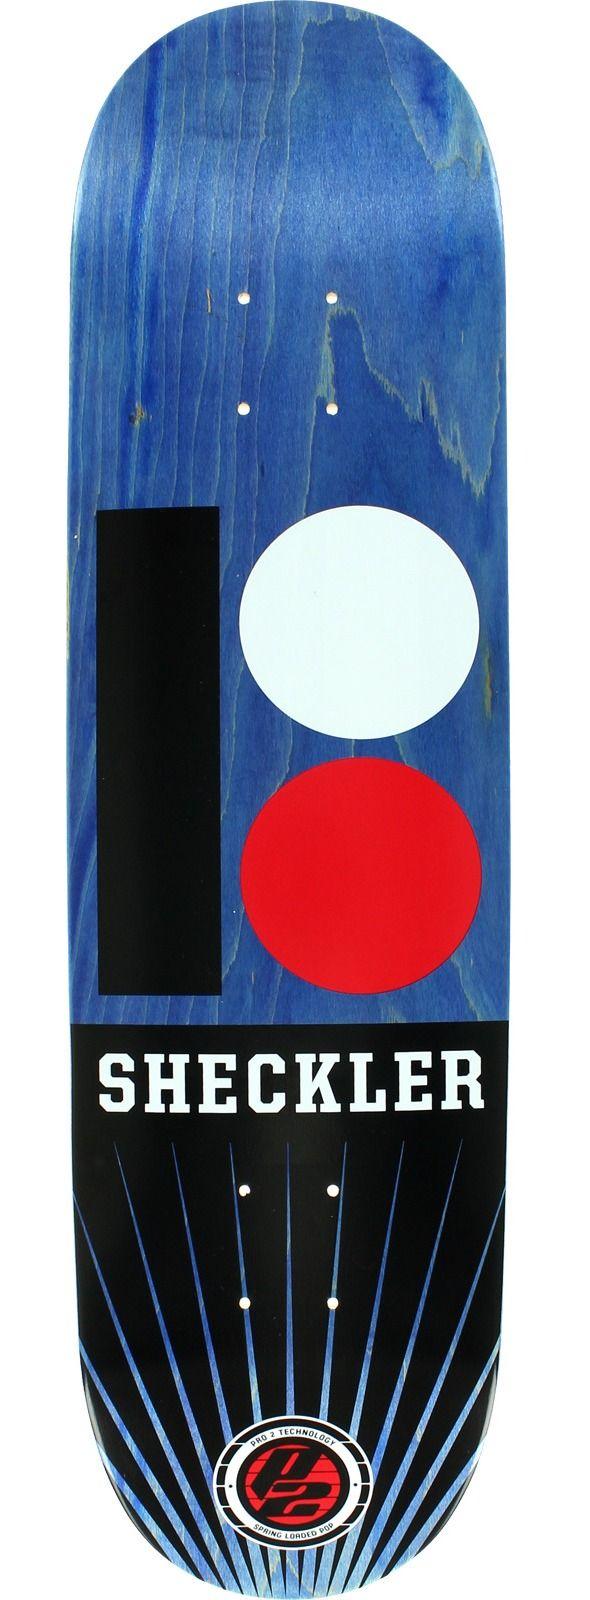 Plan B Skateboards Ryan Sheckler P2 OG RMX Skateboard Deck ...